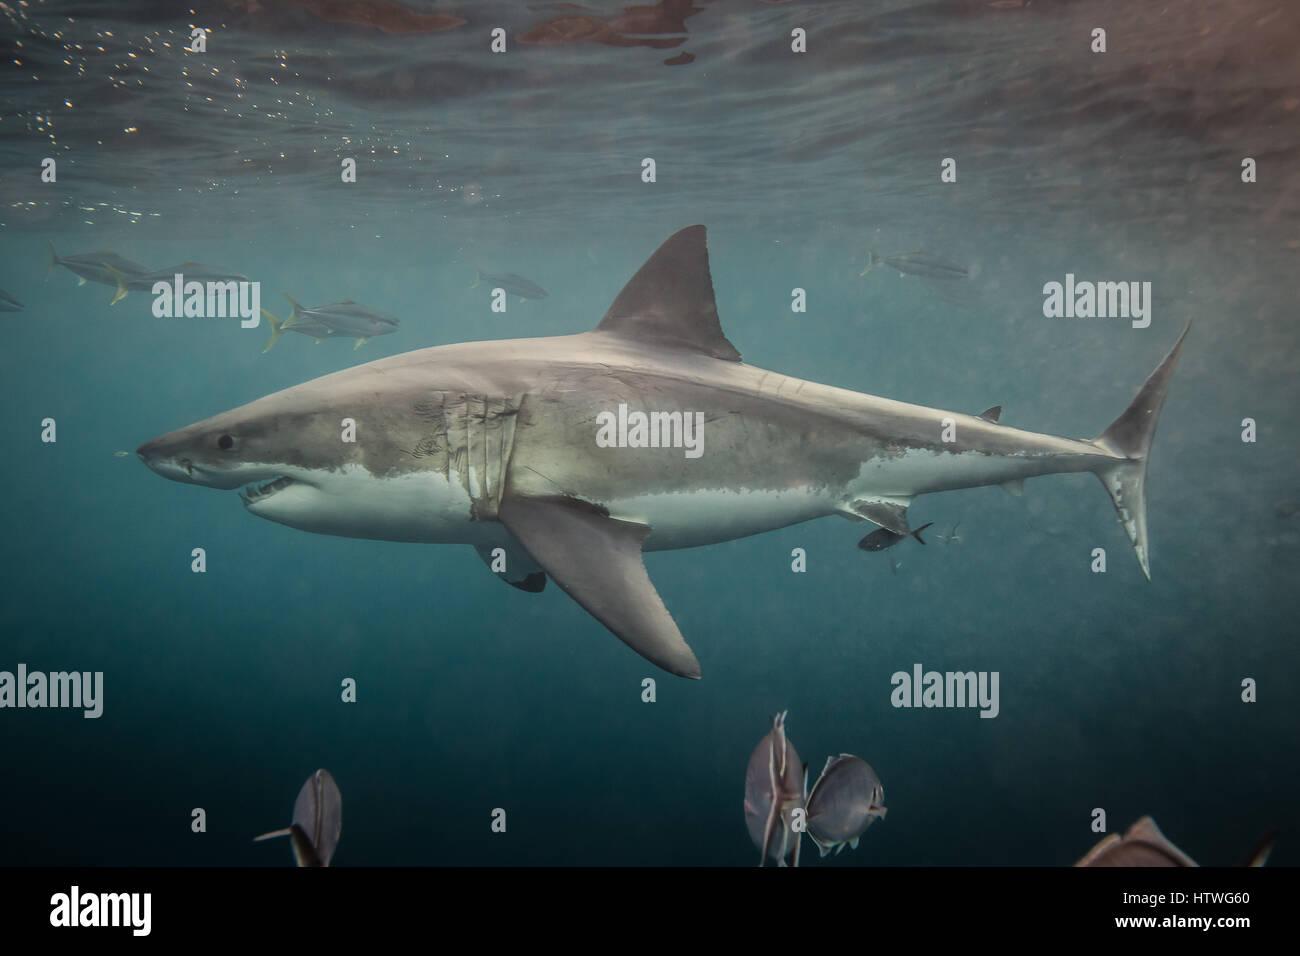 Gran Tiburón Blanco (Carcharodon carcharias) Imagen De Stock